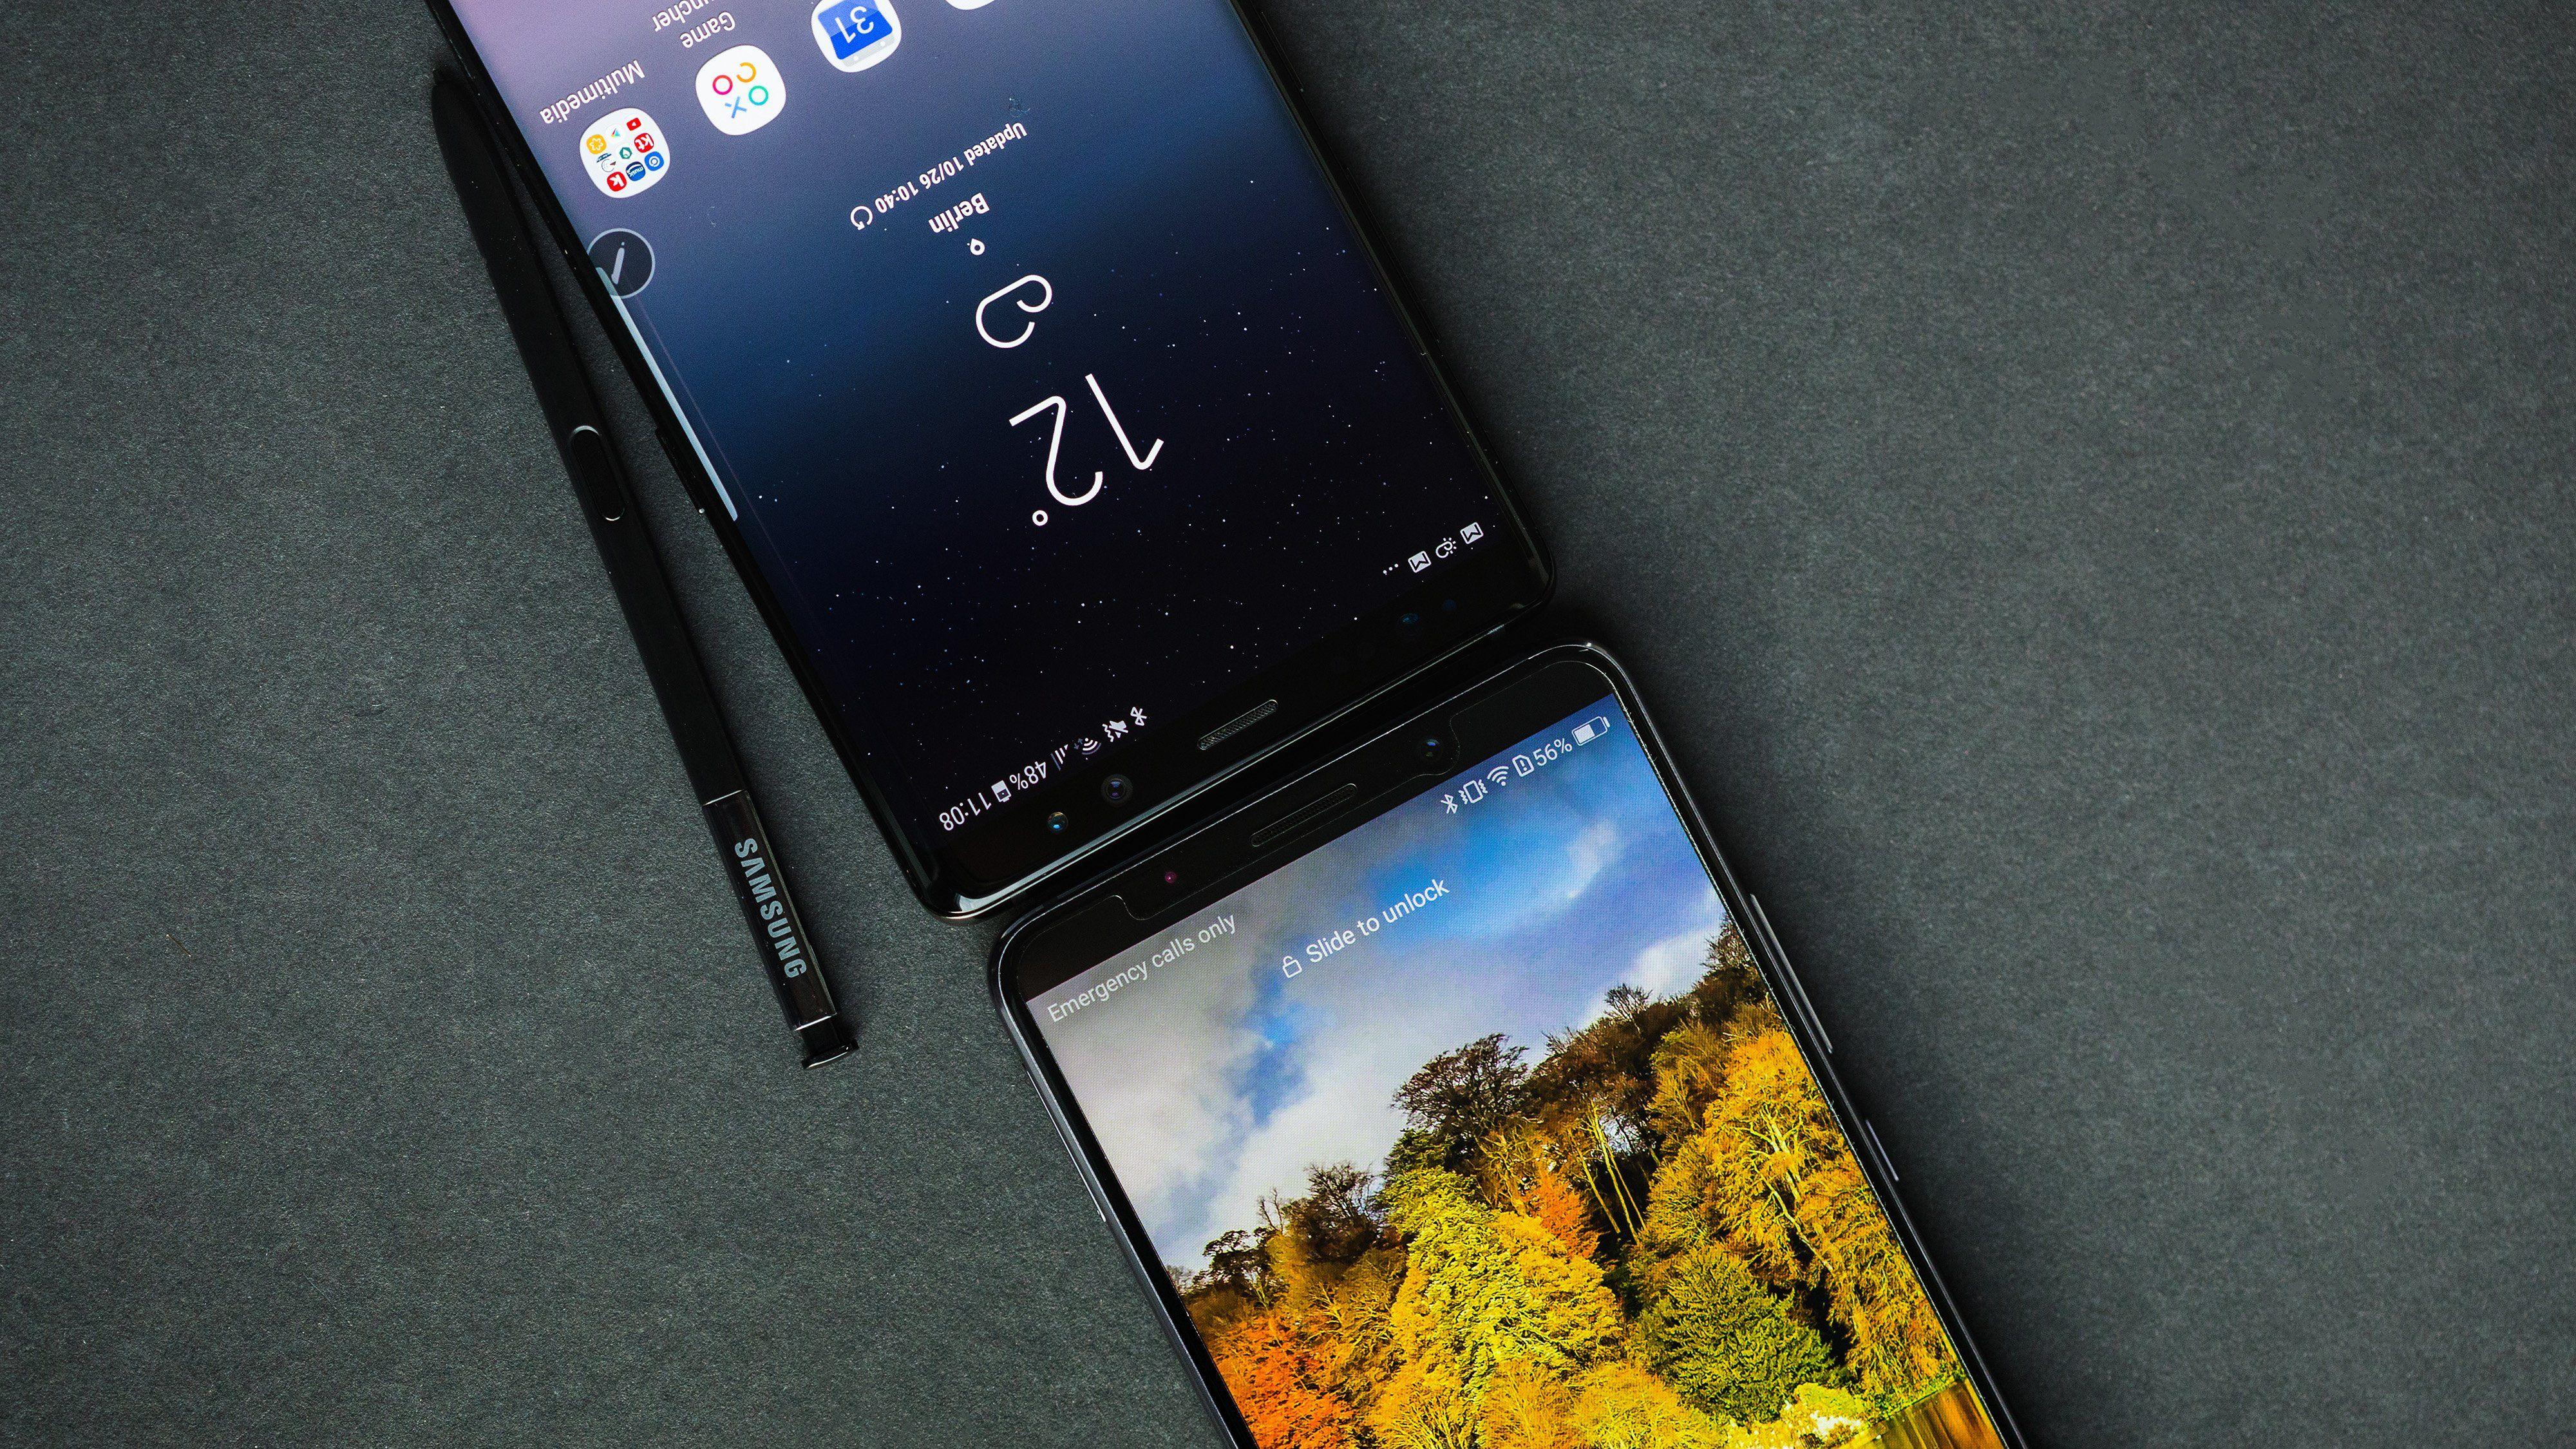 Huawei Mate 10 Pro vs Galaxy Note 8: The big battle